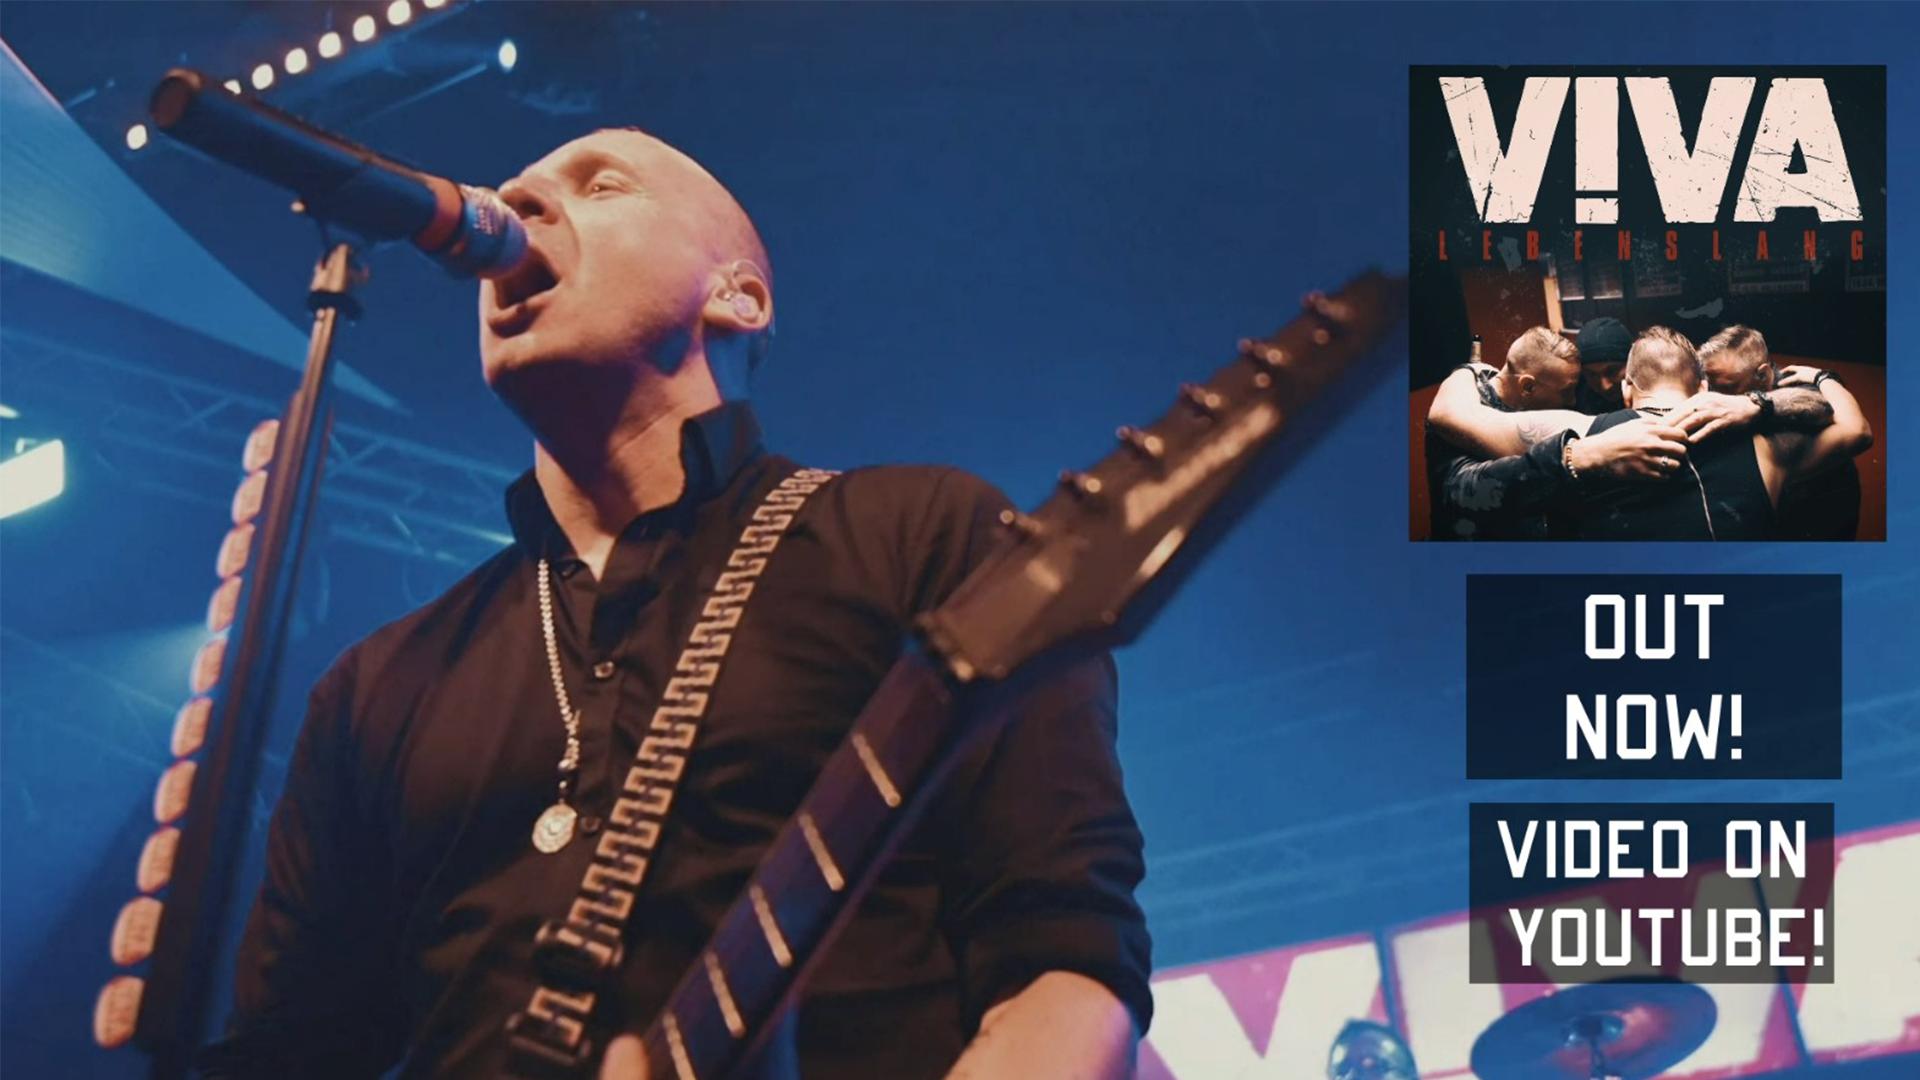 VIVA - Single&Videopremiere LEBENSLANG !   News   VIVA